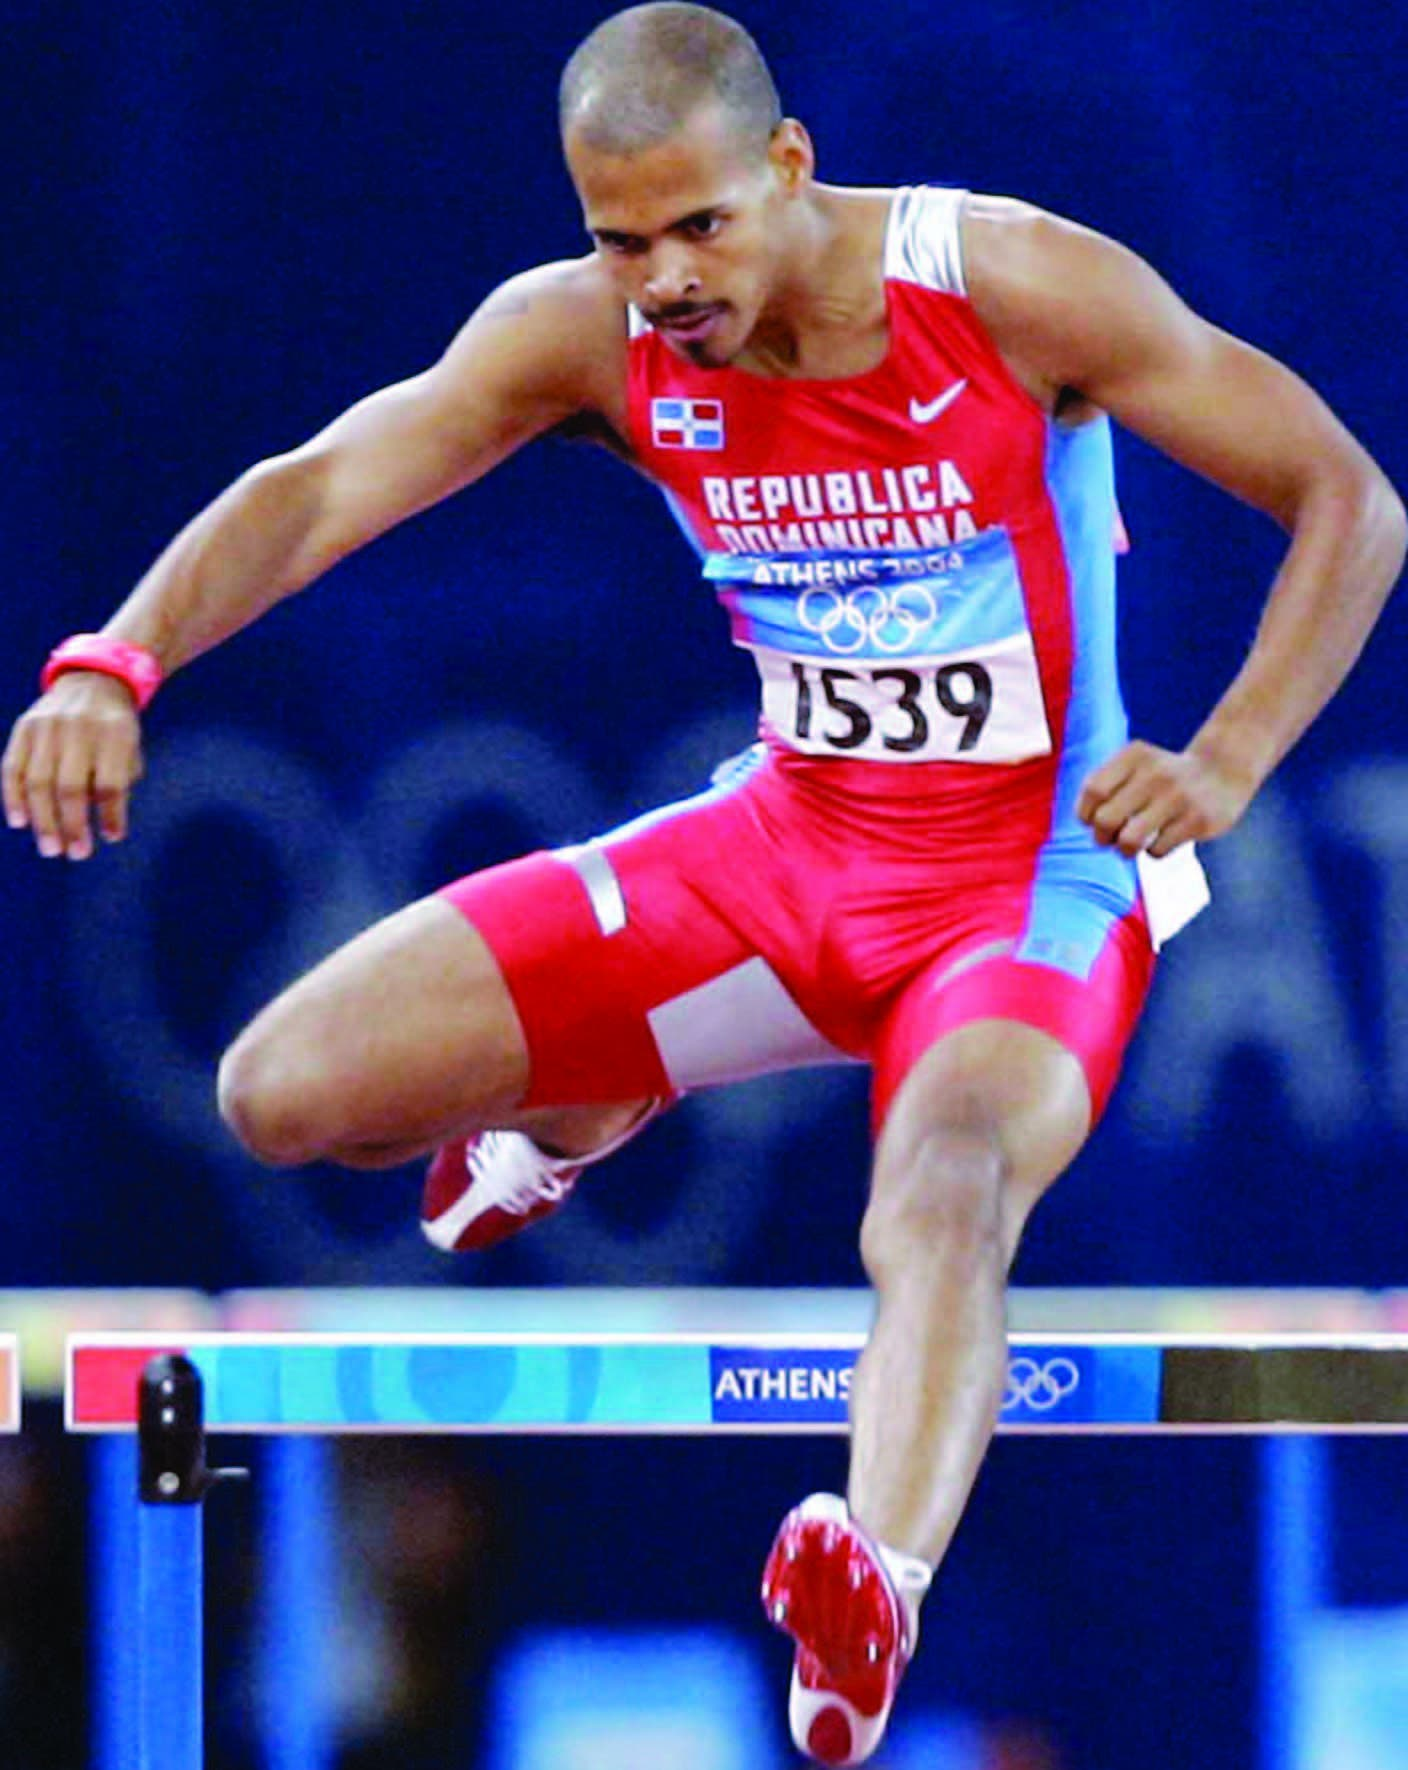 Ficha olímpica de República Dominicana